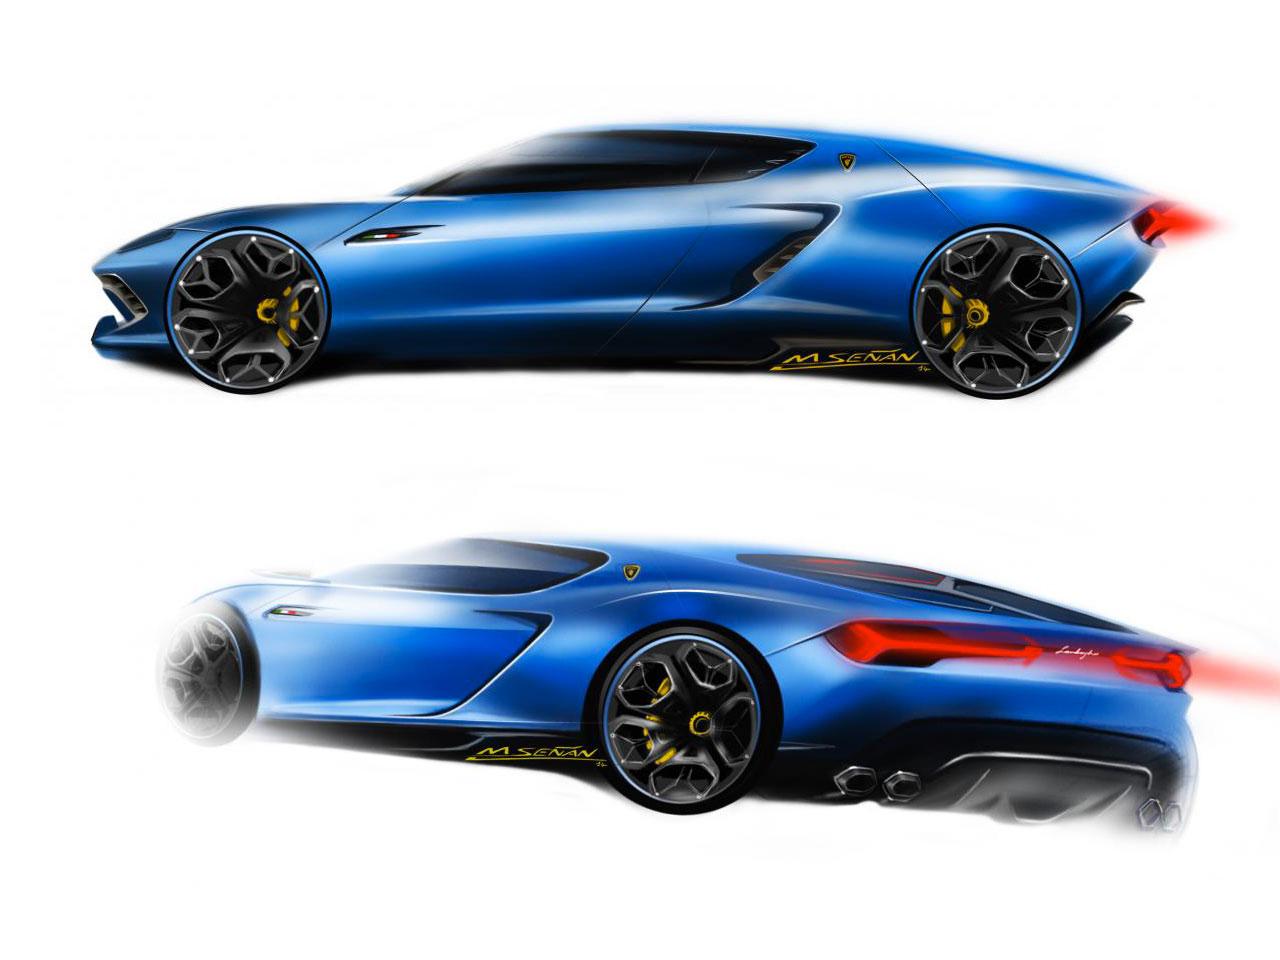 Lamborghini Asterion Lpi 910 4 The Design Car Body Design